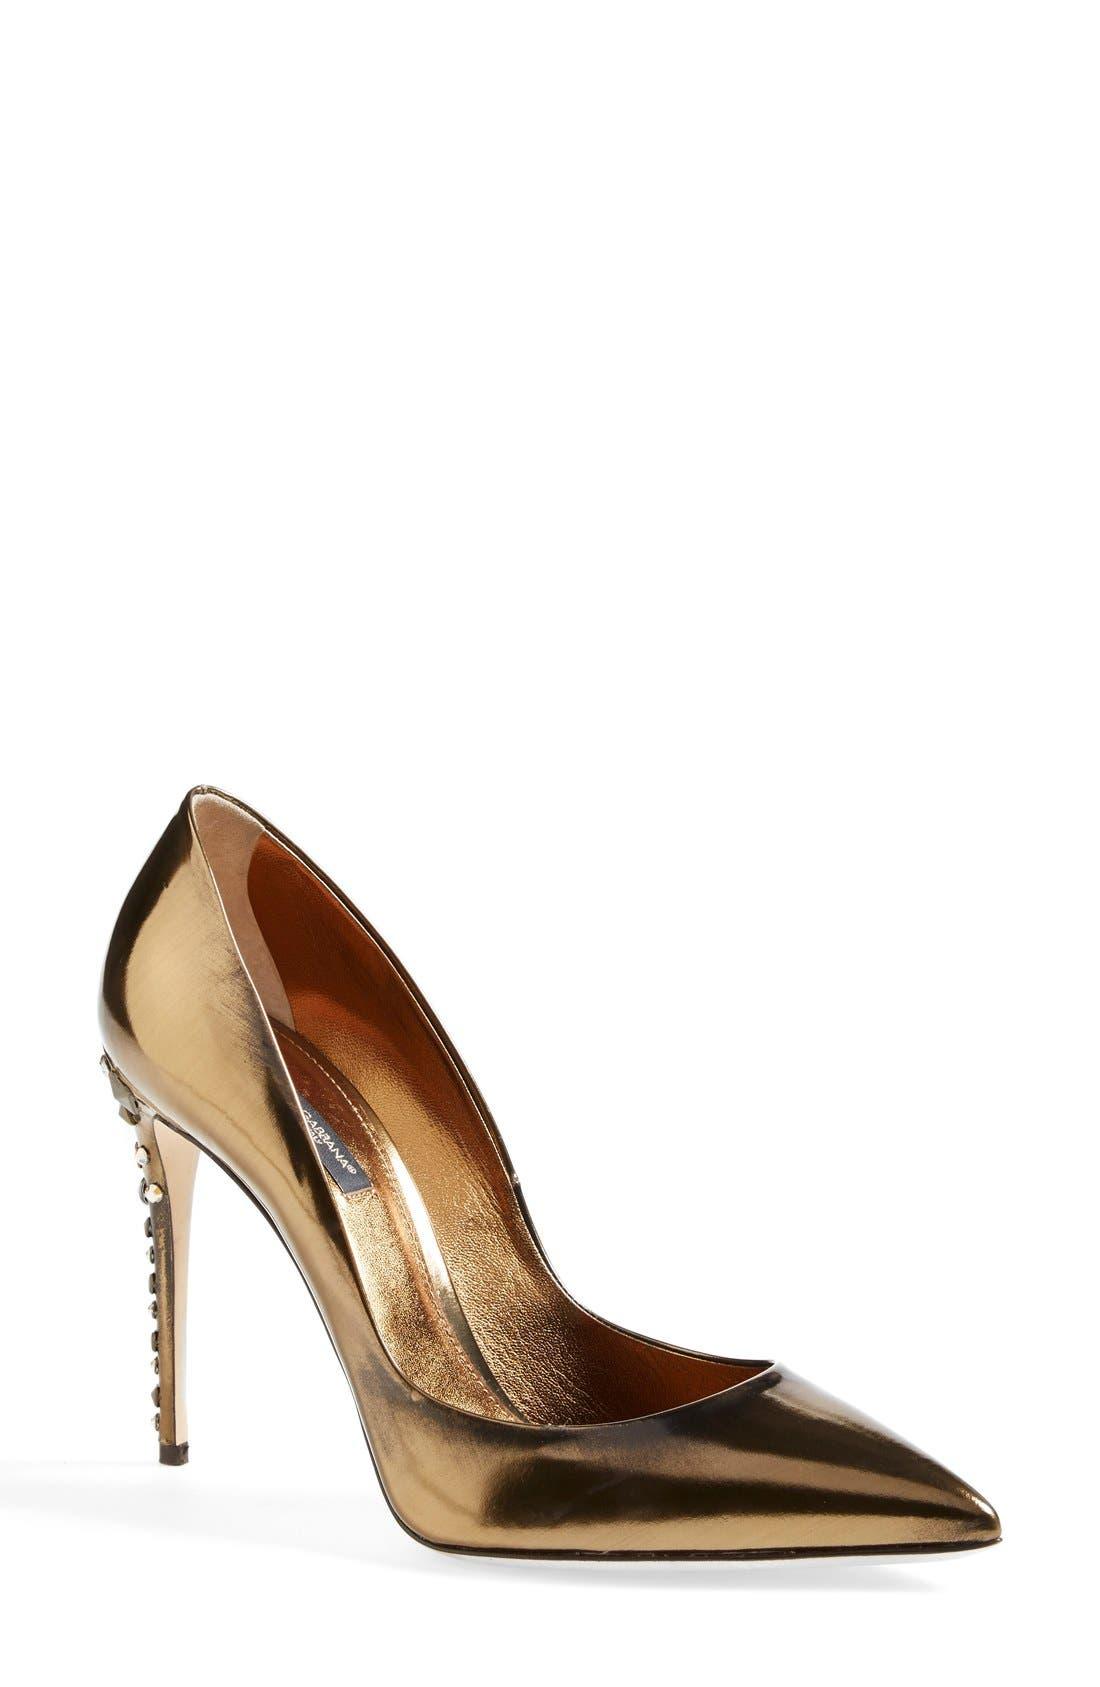 Main Image - Dolce&Gabbana Studded Heel Pump (Women)